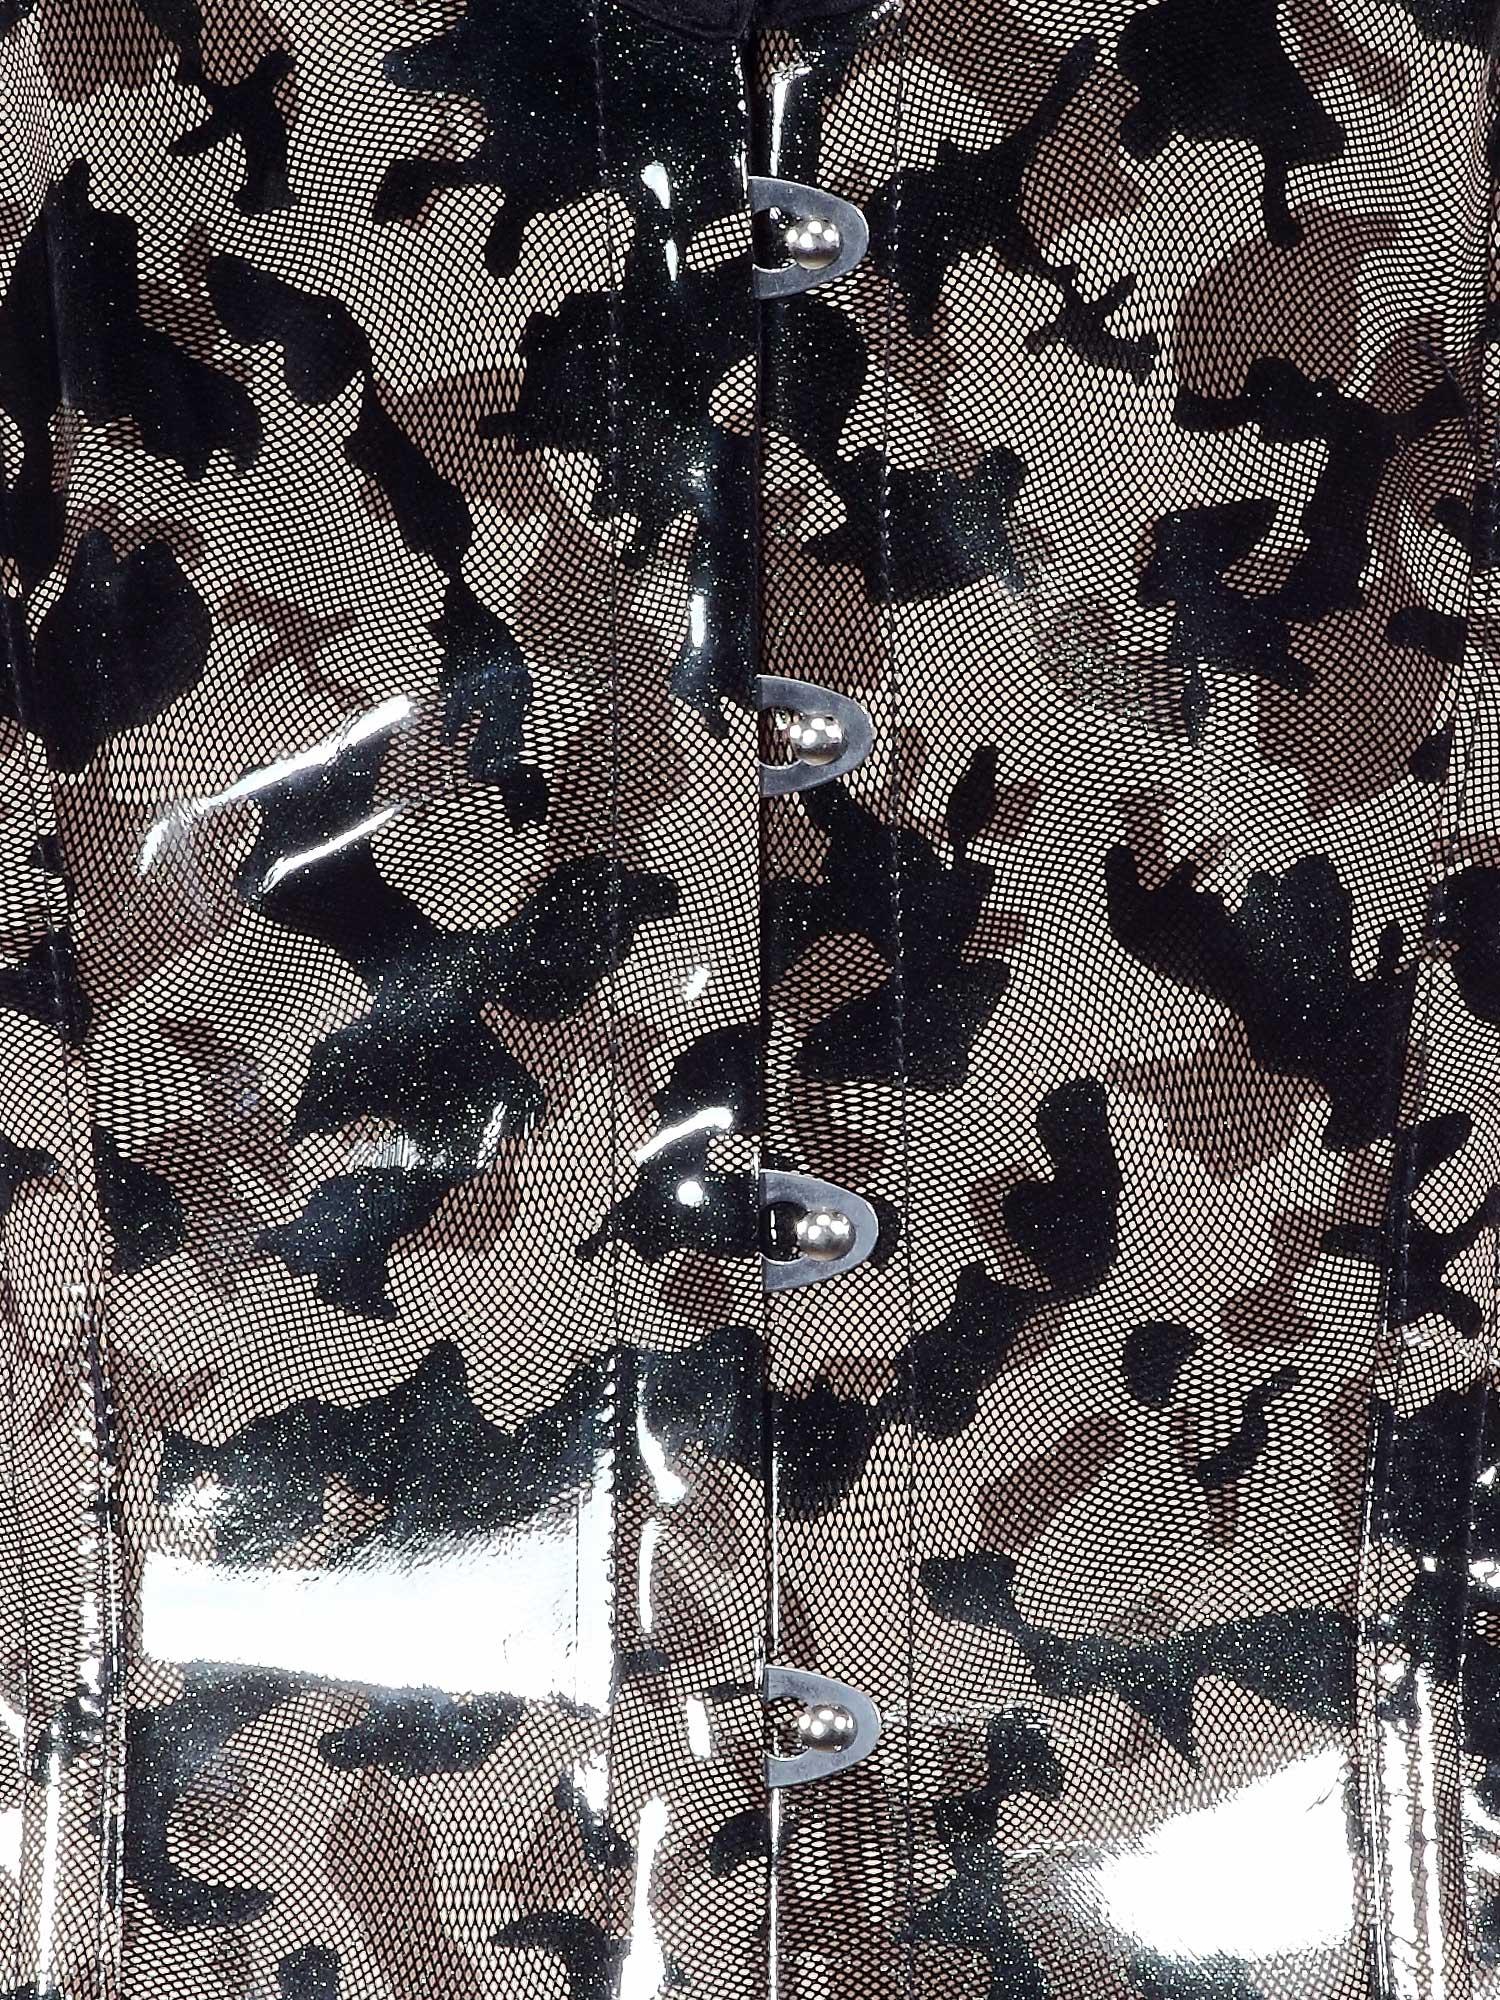 green_military_print_fabric_steel_boning_overbust_corset_waist_cincher_bustier_bustiers_and_corsets_2.jpg